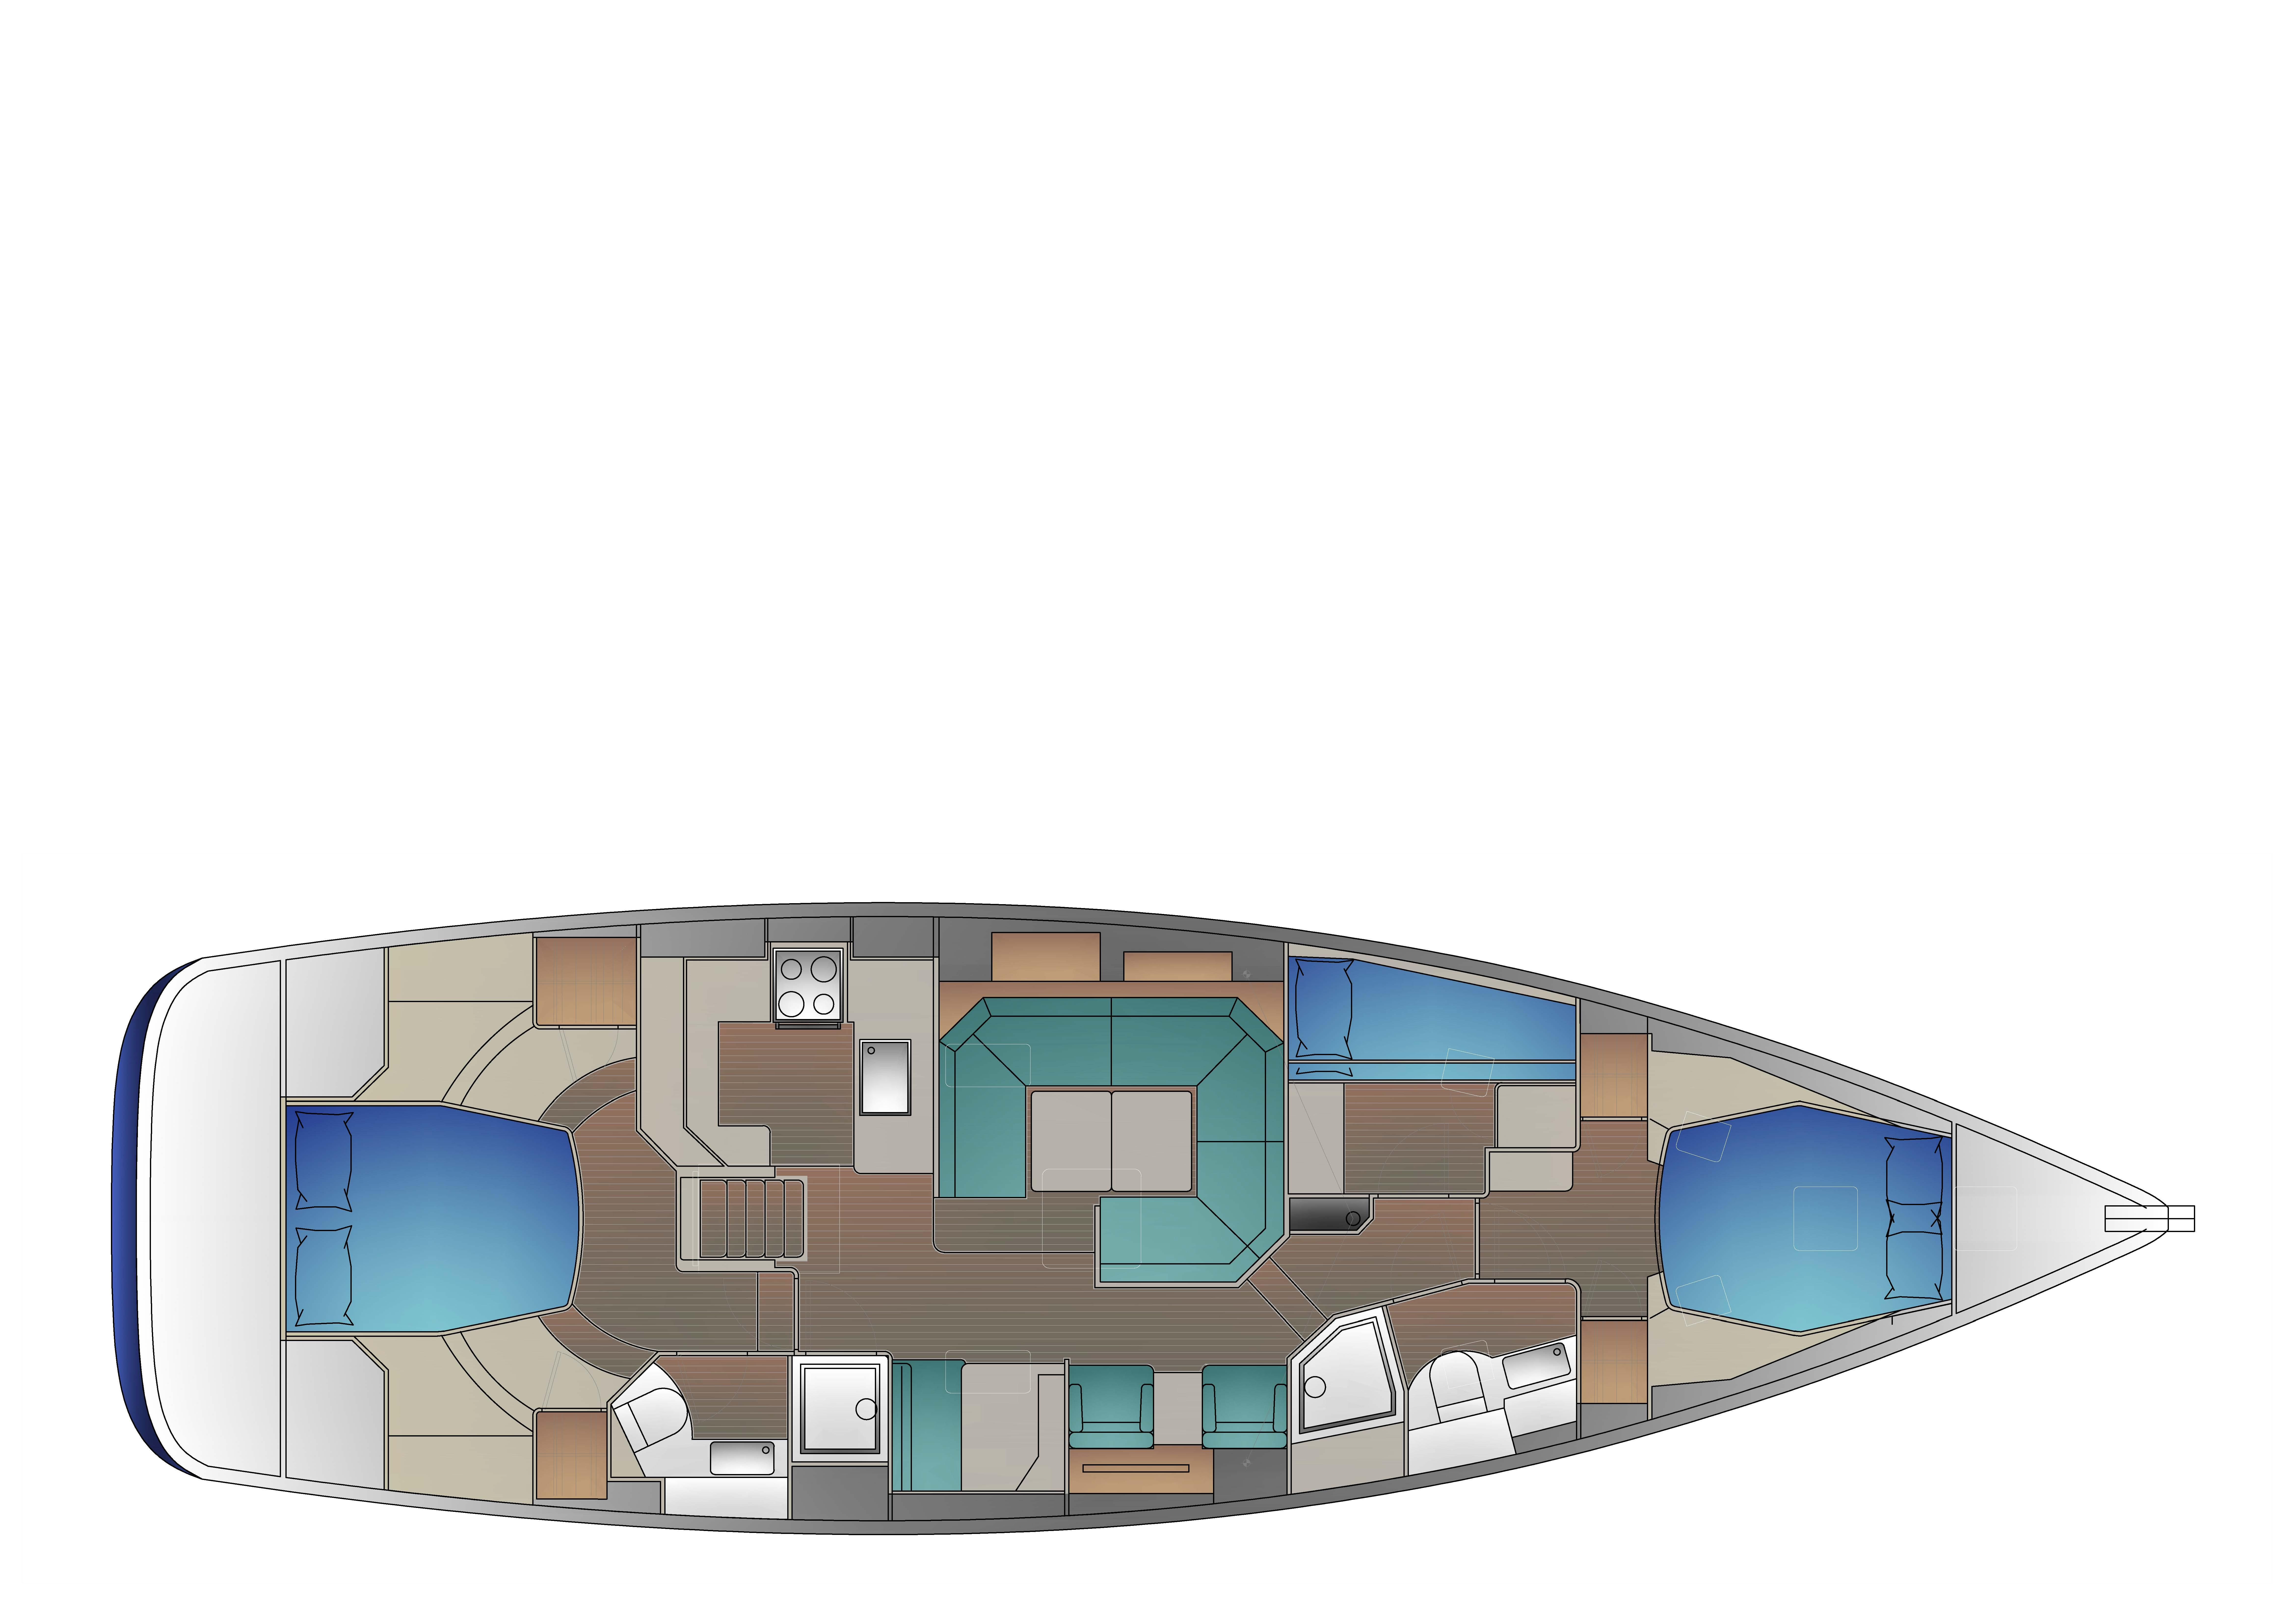 2-cabin layout with island berth forward